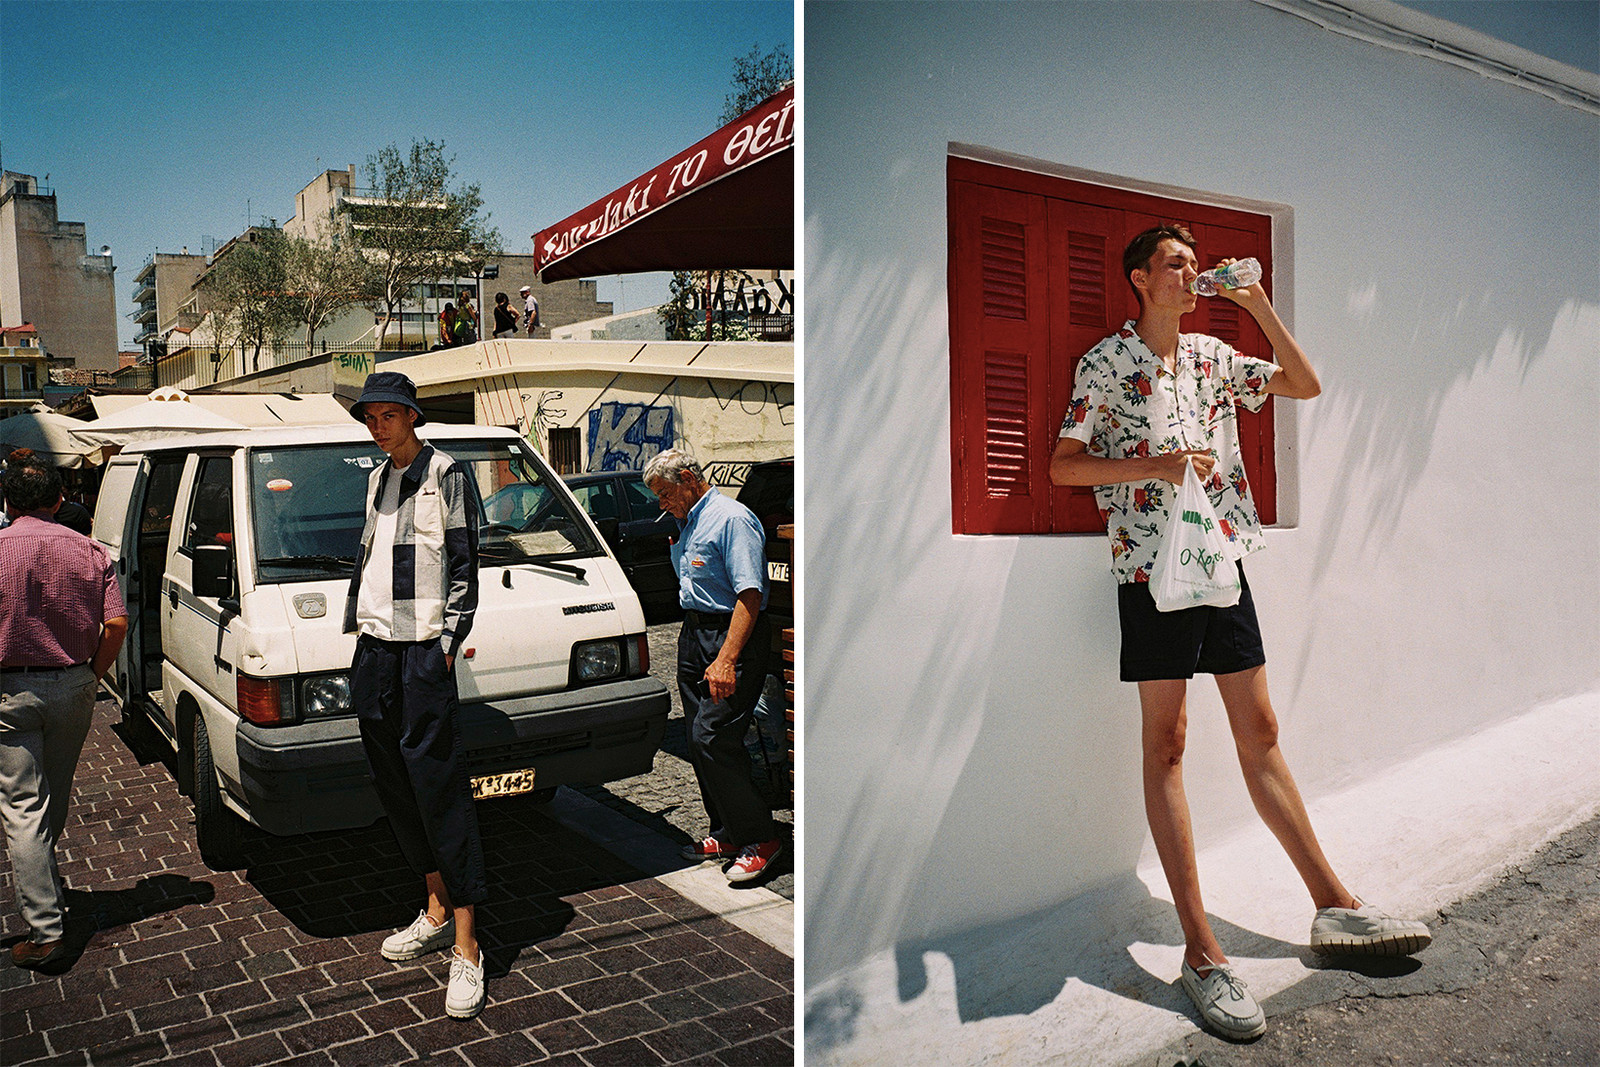 424 Slam Jam adidas Raf Simons Ozweego III Alpha Industries adidas Originals EQT Hummel Marathona OG Norse Projects Maharishi P.E. Nation Reebok YMC Mita Filling Pieces